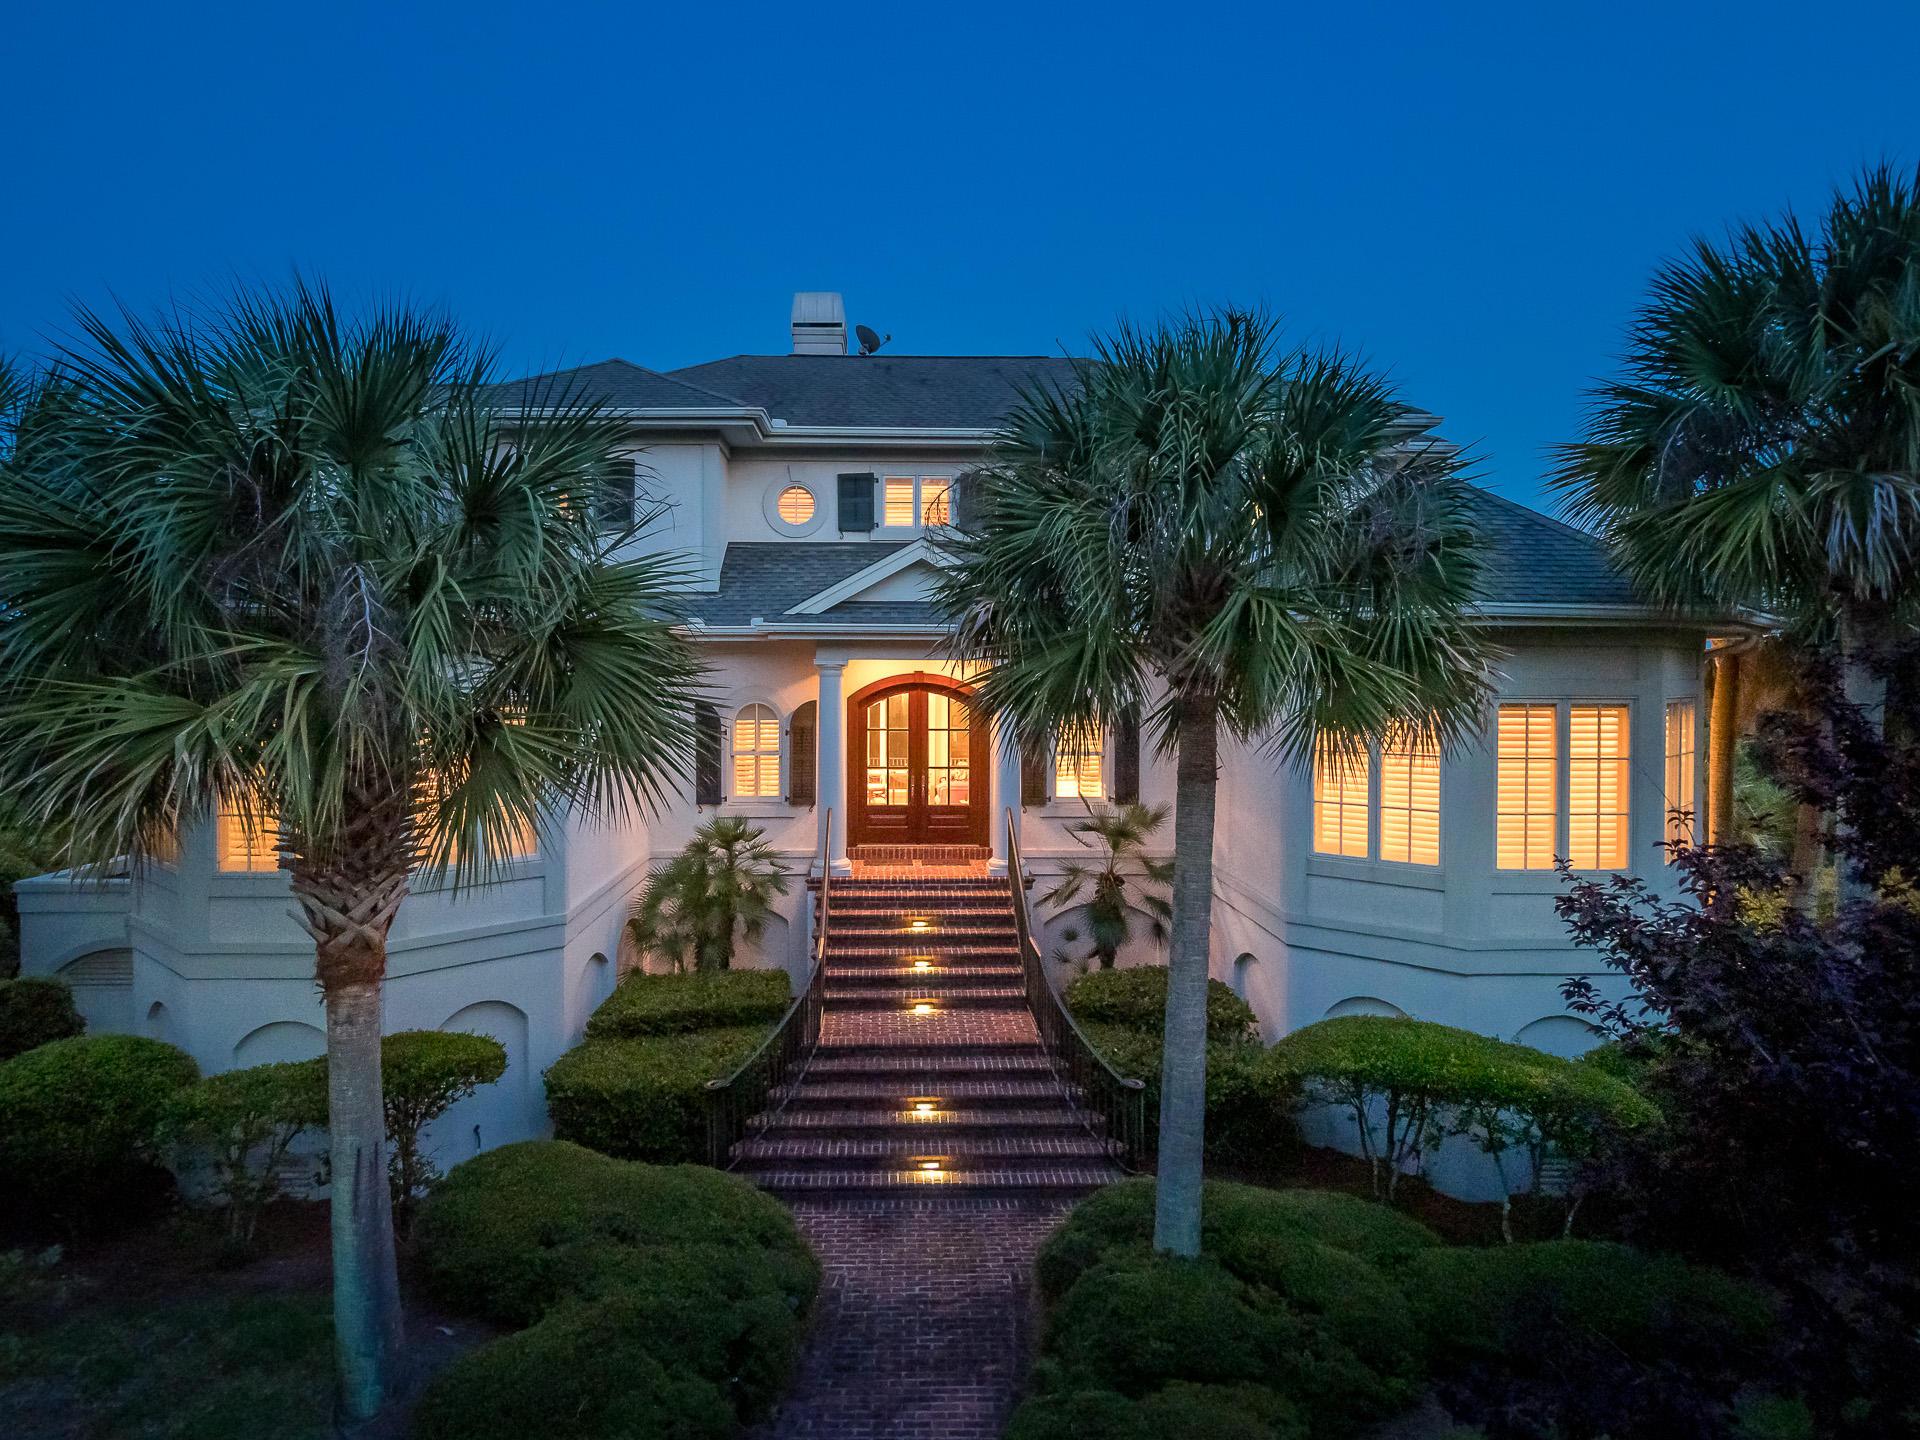 Seabrook Island Homes For Sale - 2216 Rolling Dune, Seabrook Island, SC - 21